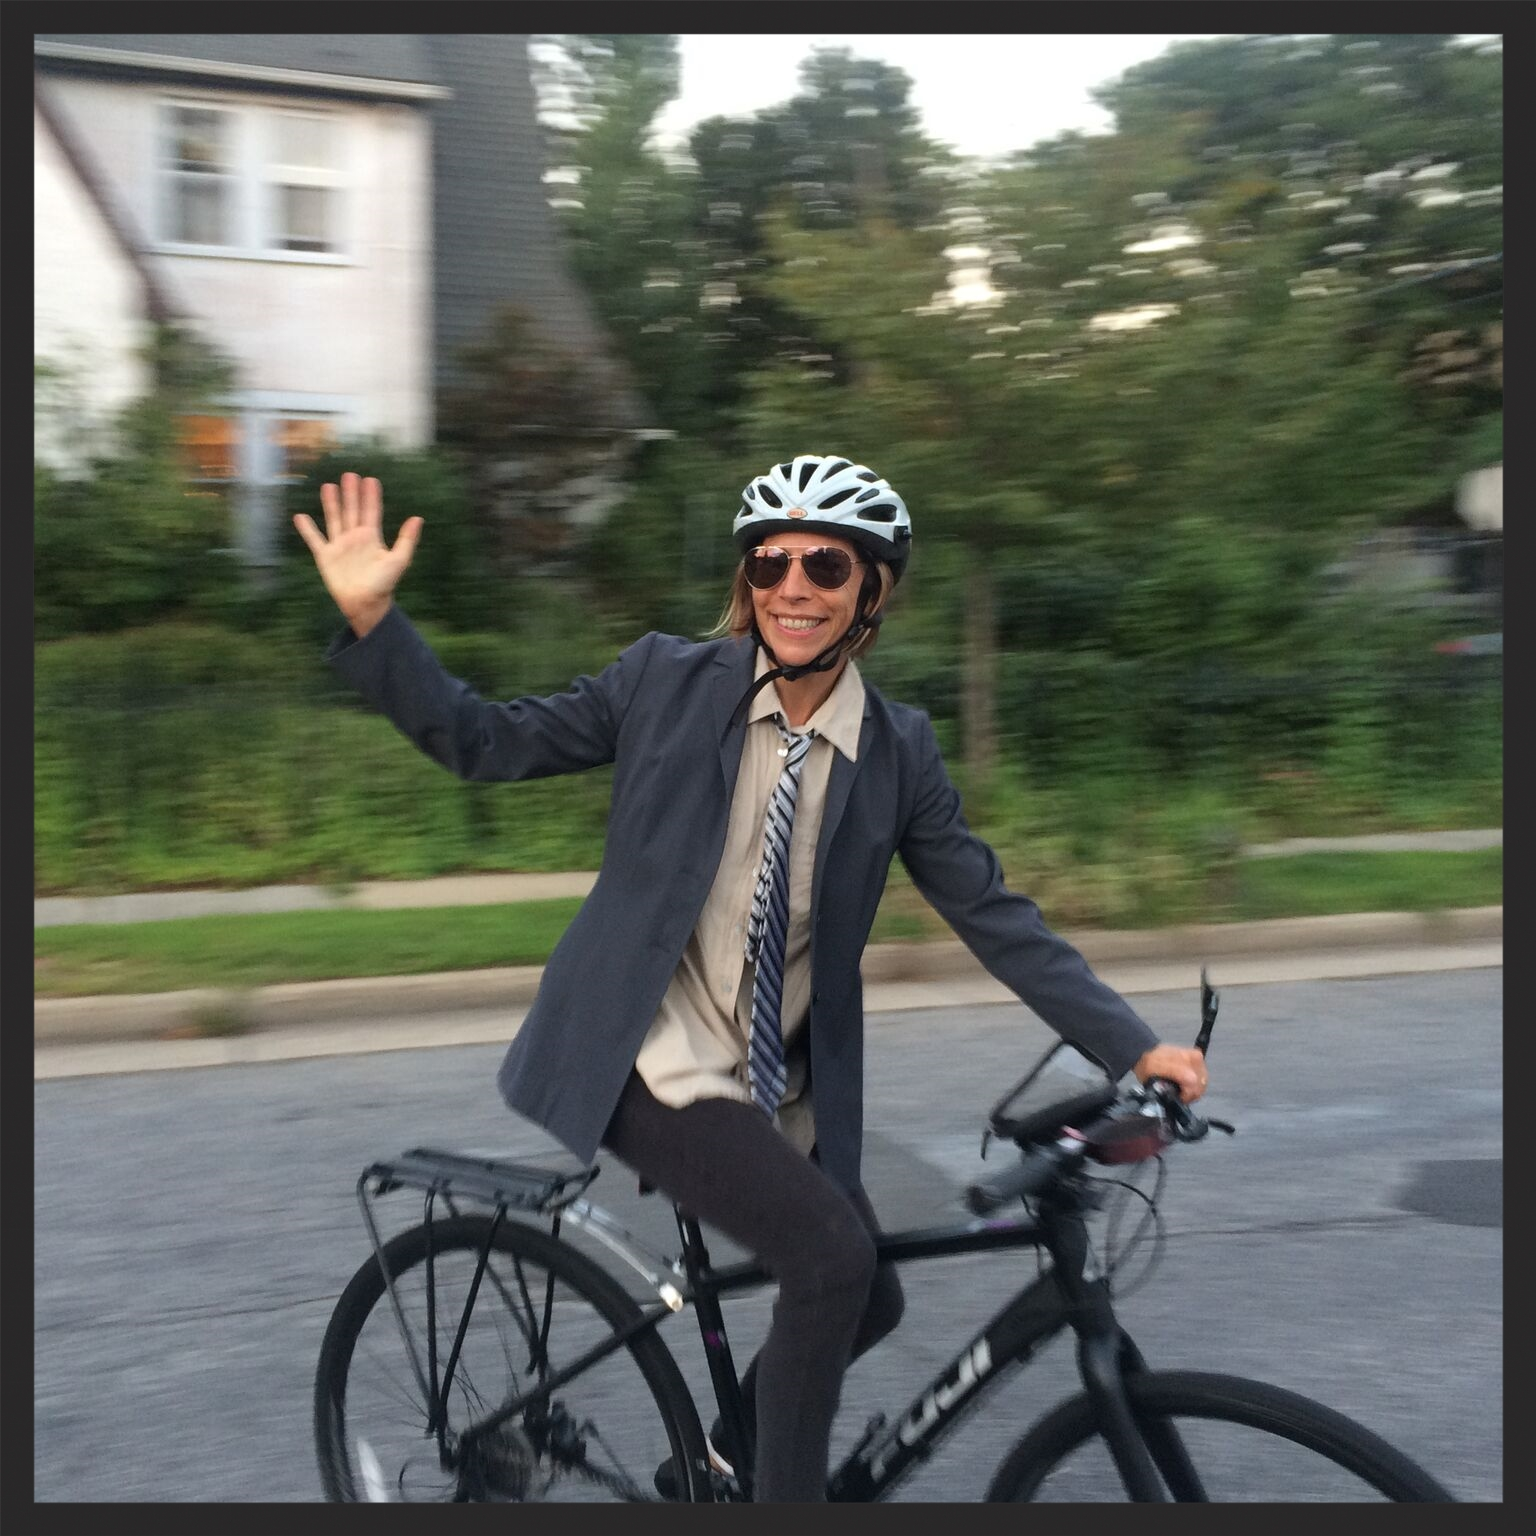 Me enjoying my now-stolen bike. Photo credit: Barry Germond.